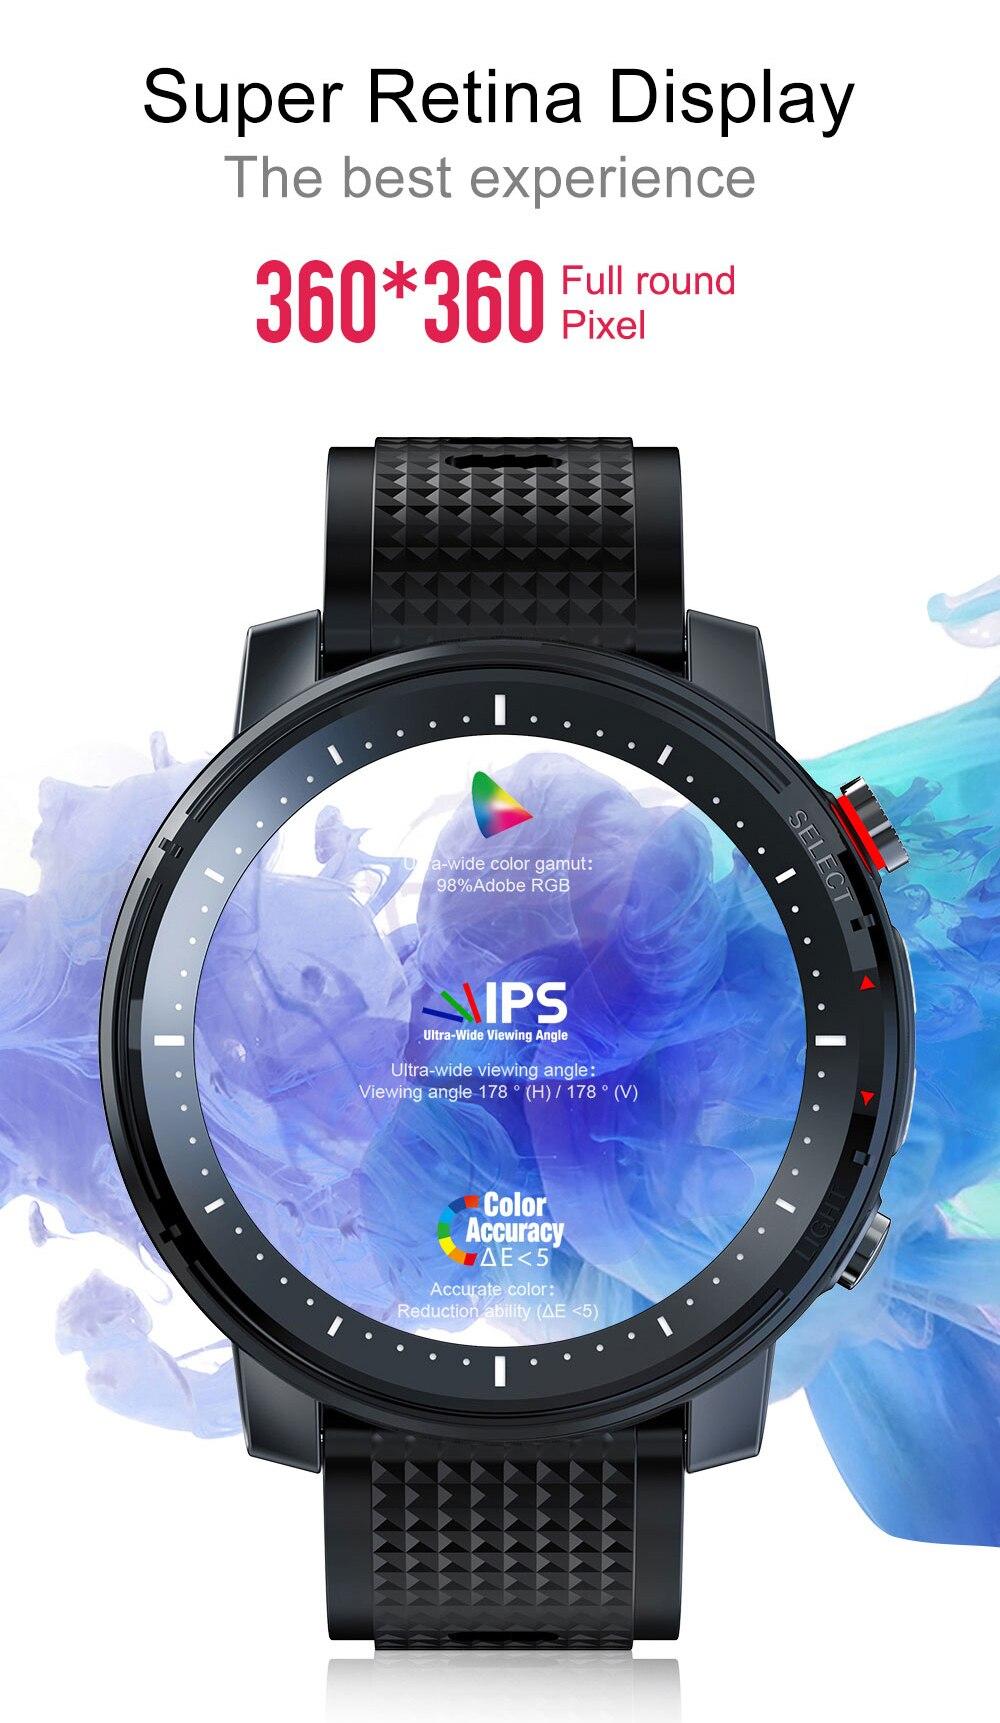 H57948c4a313a48a380288e58e9c780f19 Timewolf Reloj Inteligente Smart Watch Men 2021 IP68 Waterproof Android Smartwatch Smart Watch for Men Women Android Phone IOS